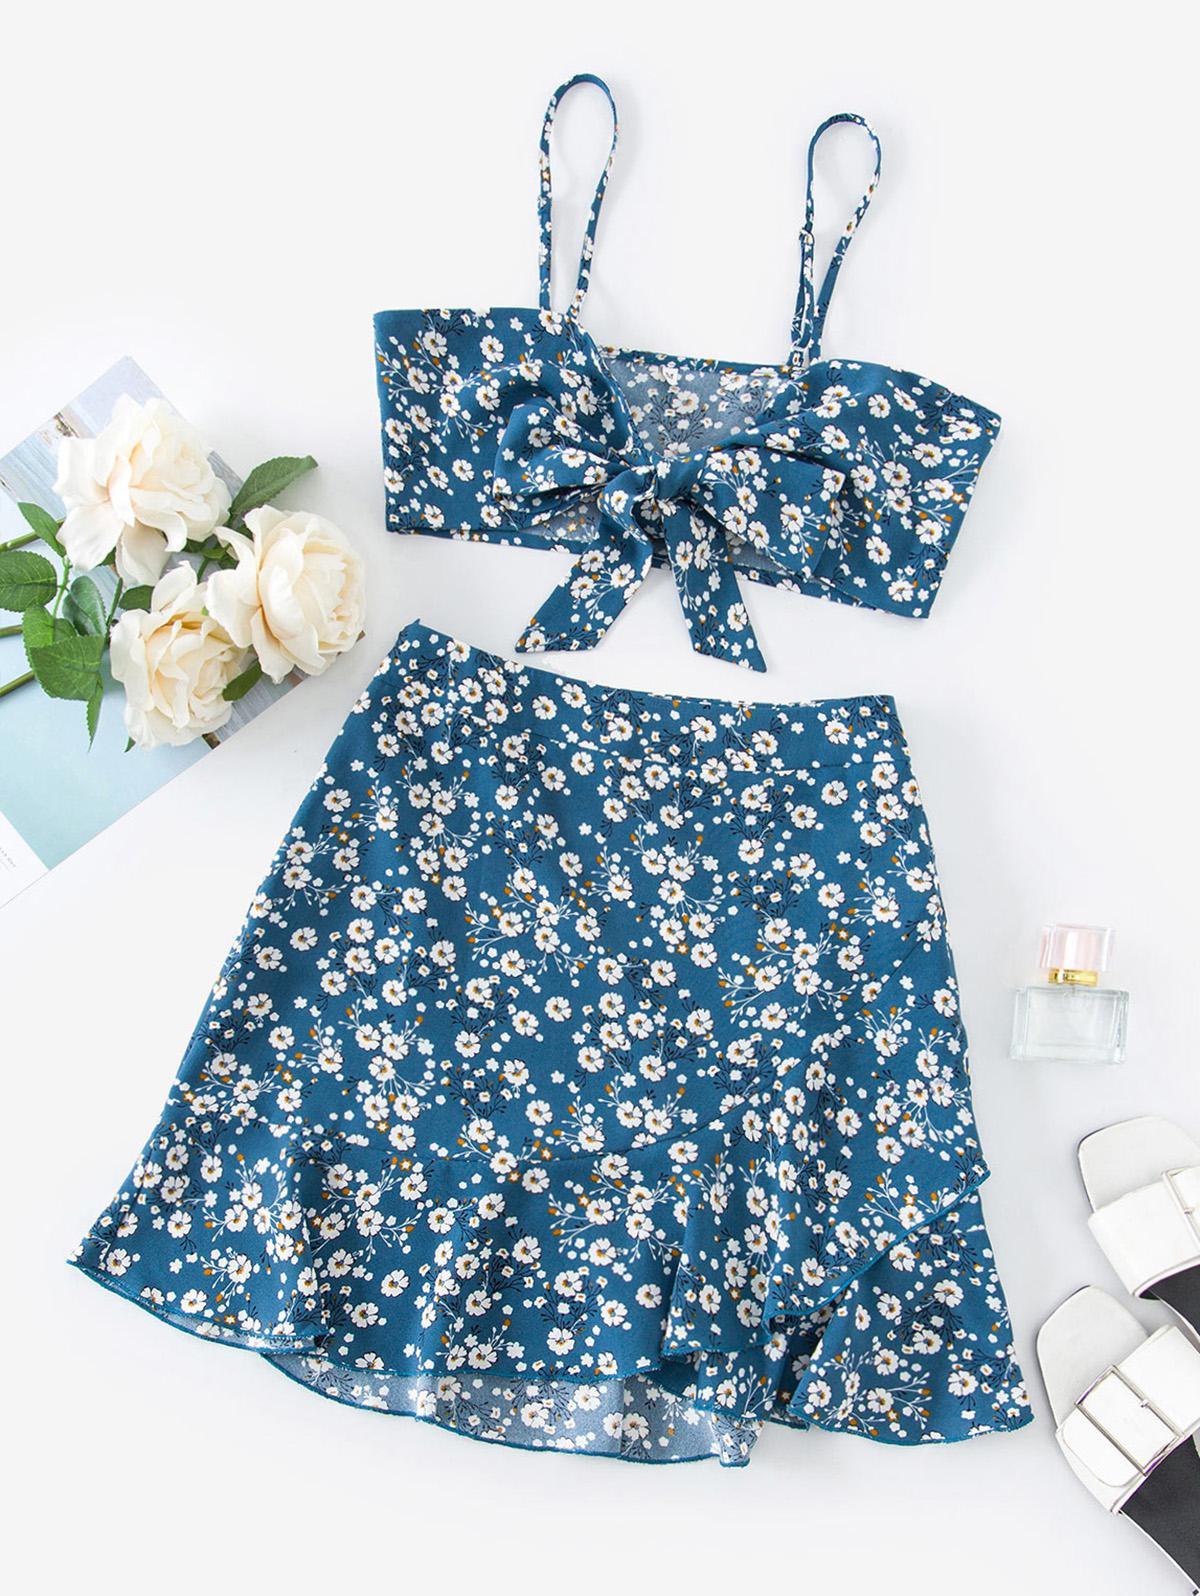 ZAFUL Ditsy Print Tie Front Ruffle Skirt Set